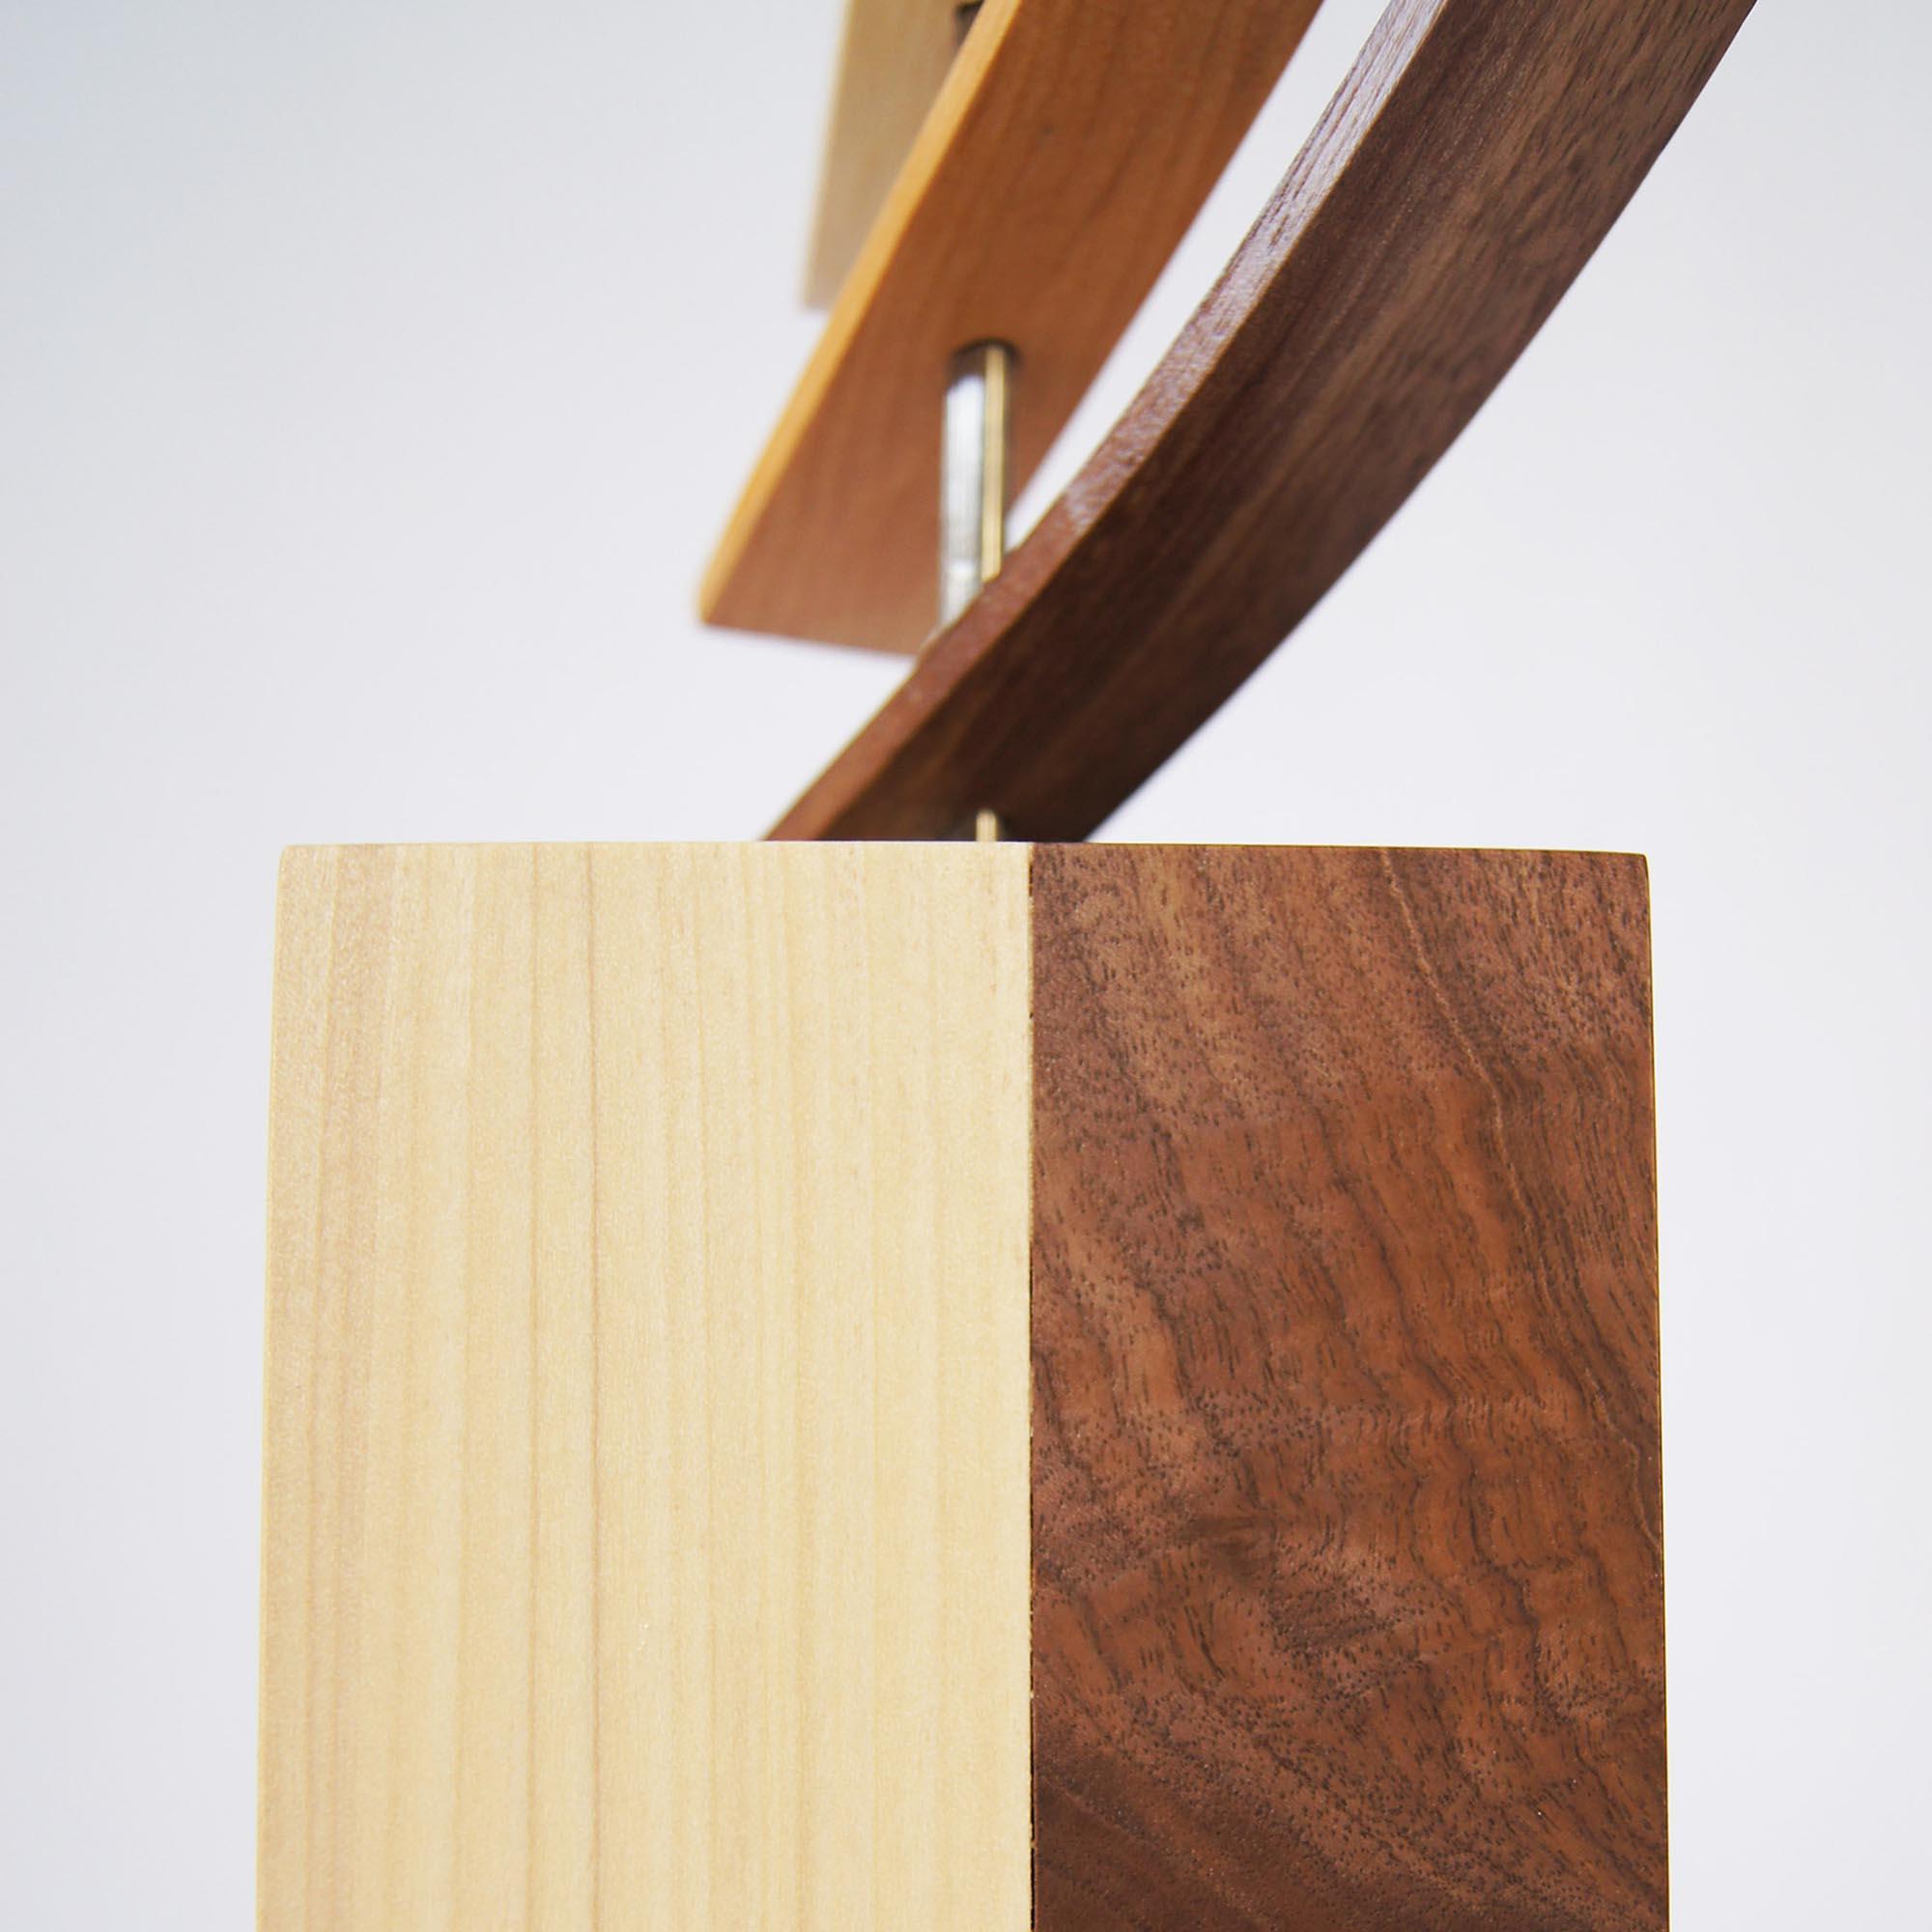 The Climb by Jeff Linenkugel - Modern Wood Sculpture on Natural Wood - Image 3